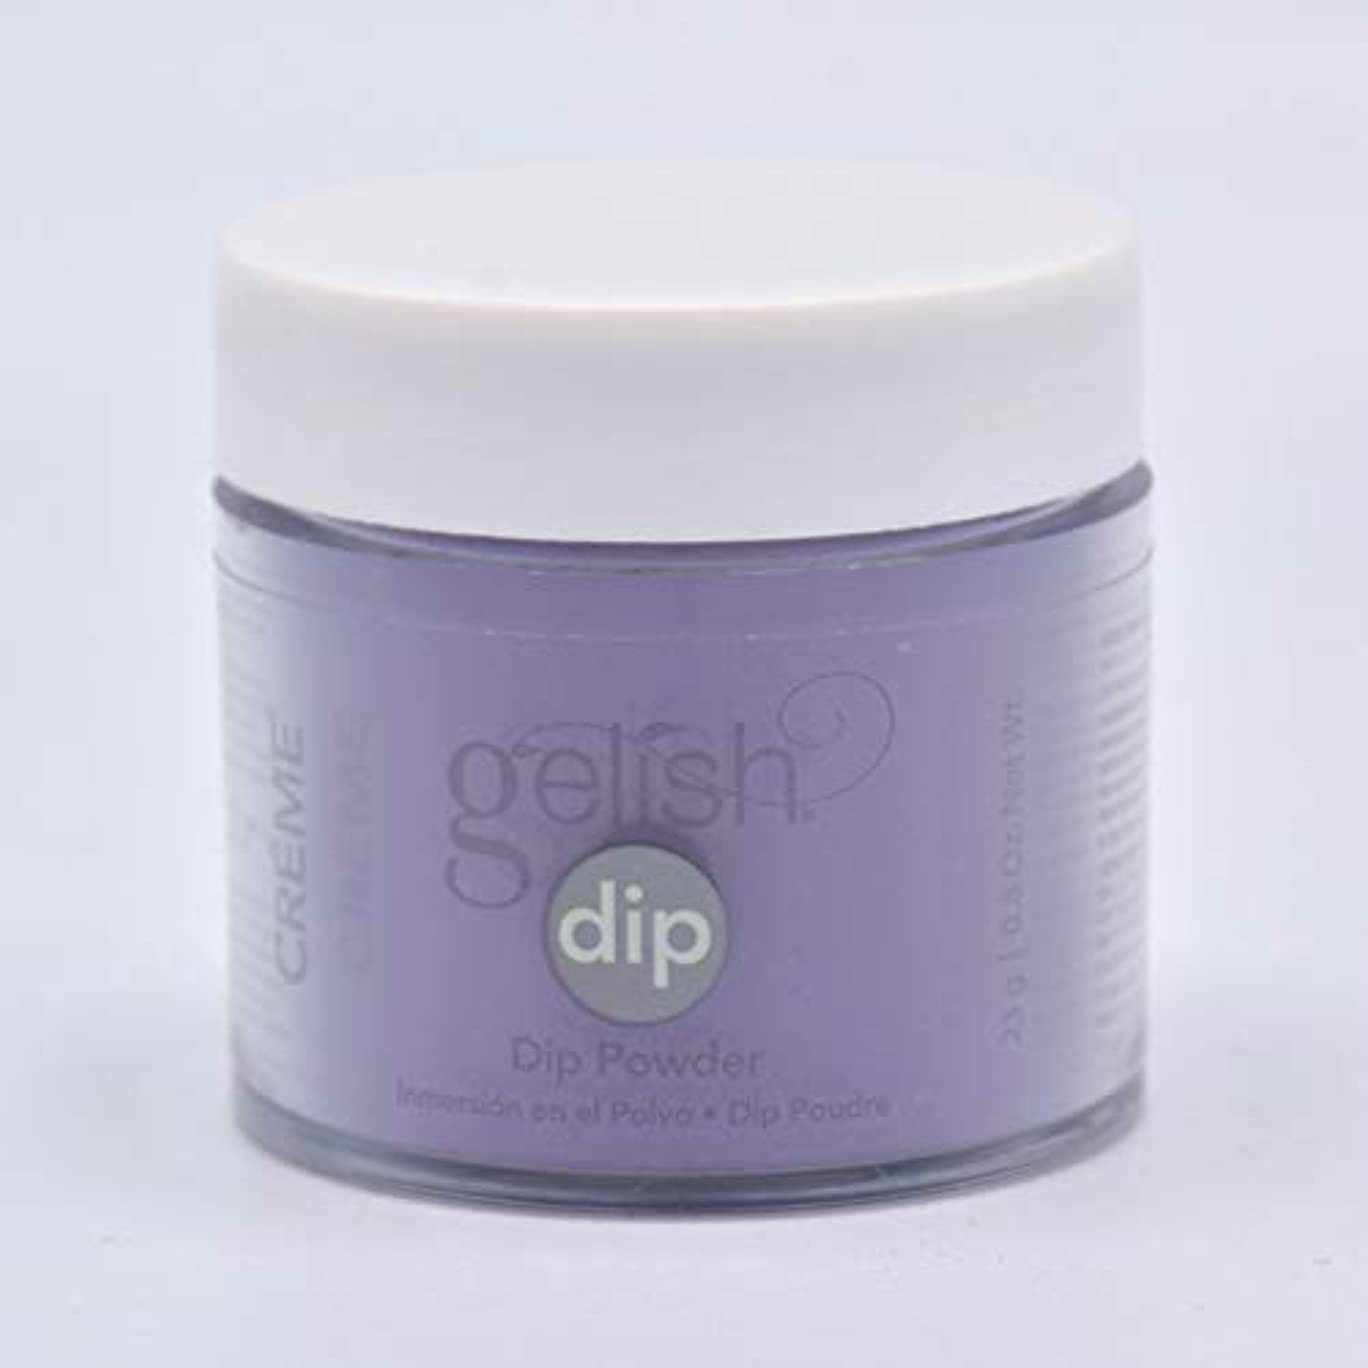 外交問題公平な月曜Harmony Gelish - Acrylic Dip Powder - Black Cherry Berry - 23g / 0.8oz